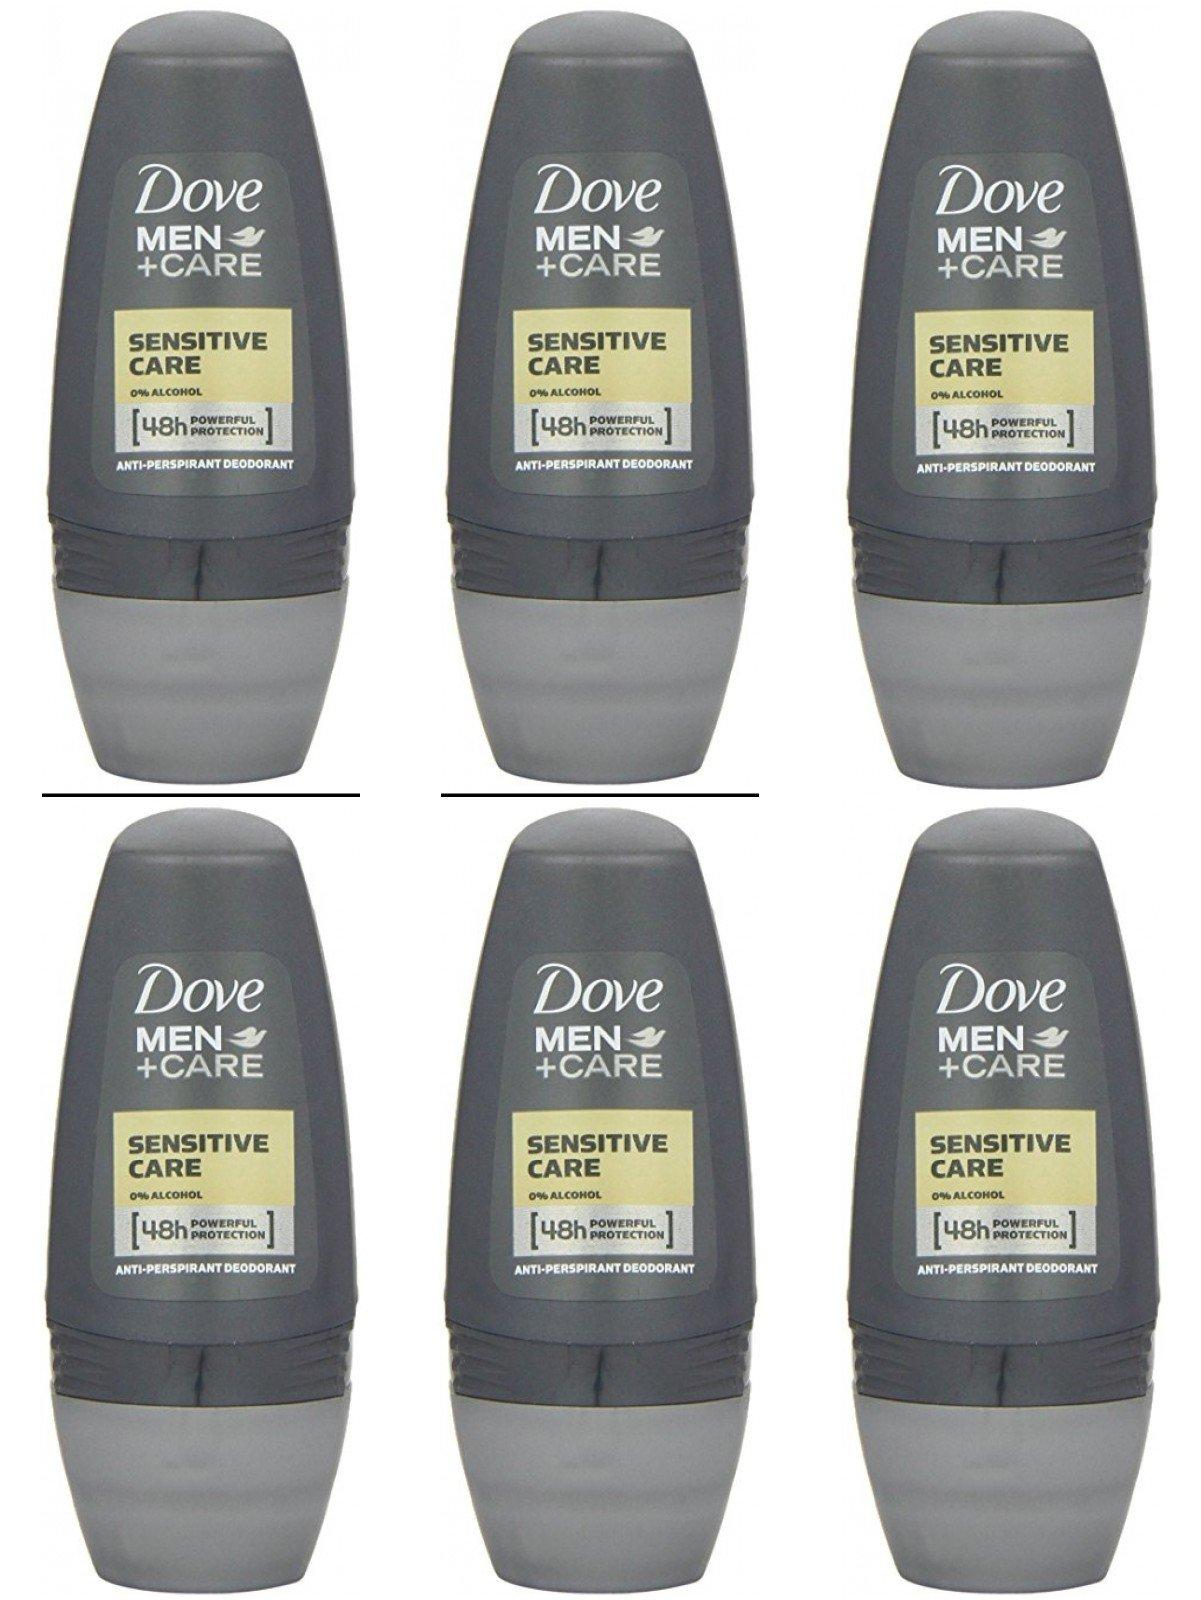 Dove Men+Care Sensitive Care Antiperspirant Deodorant Roll-On 1.7 Oz 50 Ml Travel Size (Pack of 6)